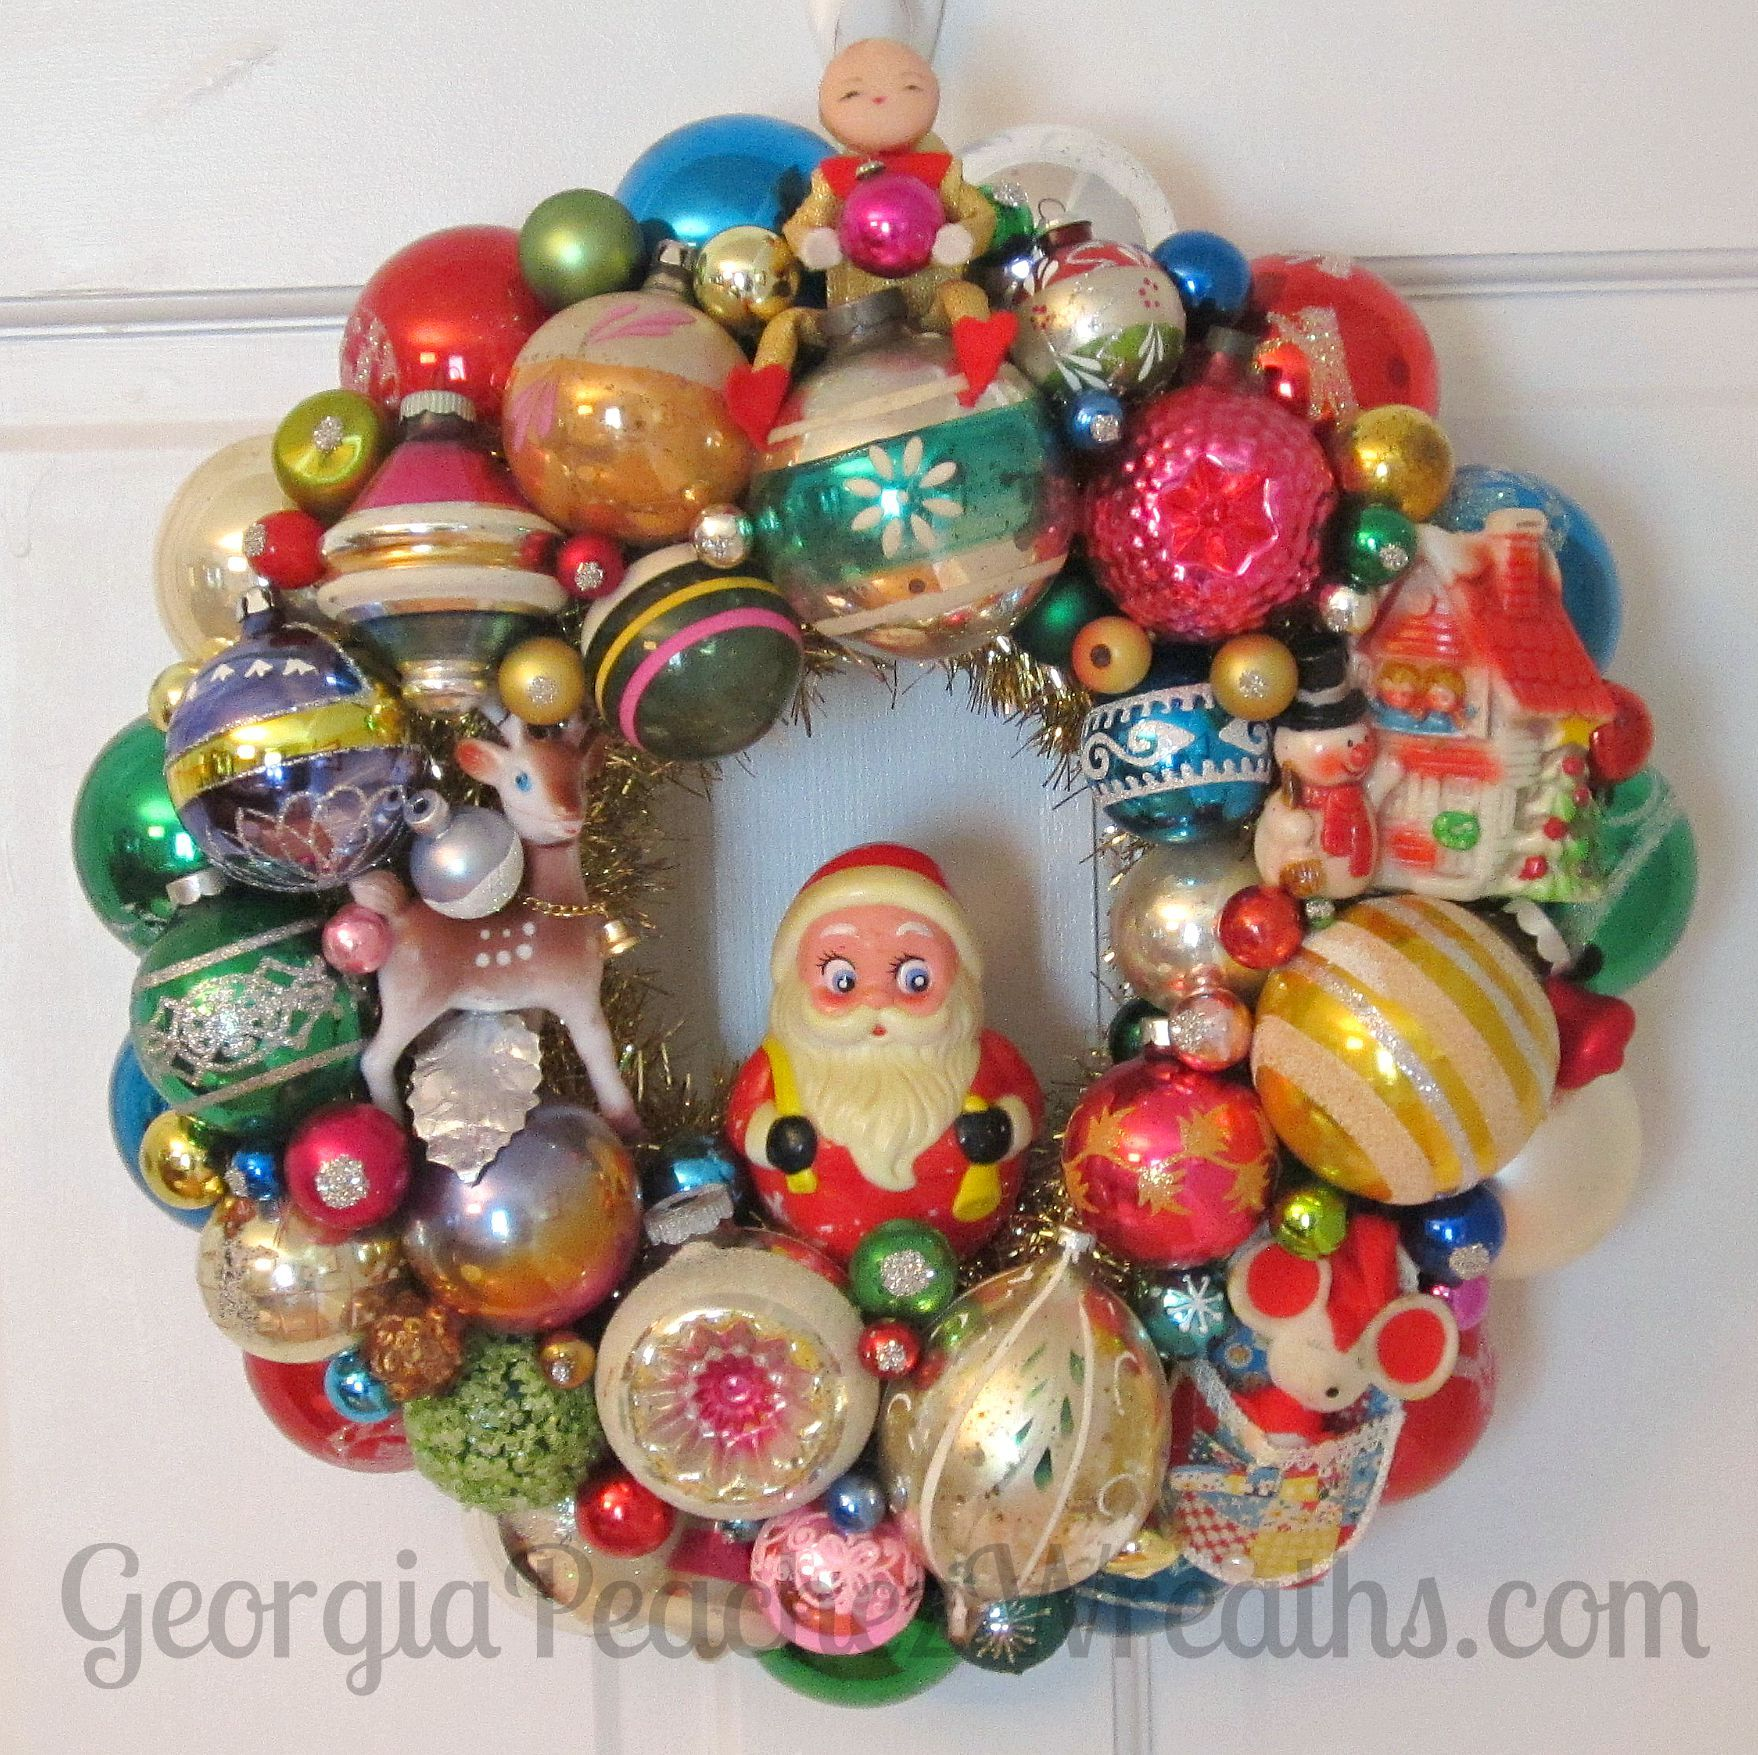 Vintage Ornament Wreath Georgiapeachezwreaths Com Kitsch Christmas Vintage Ornament Wreath Vintage Christmas Ornaments